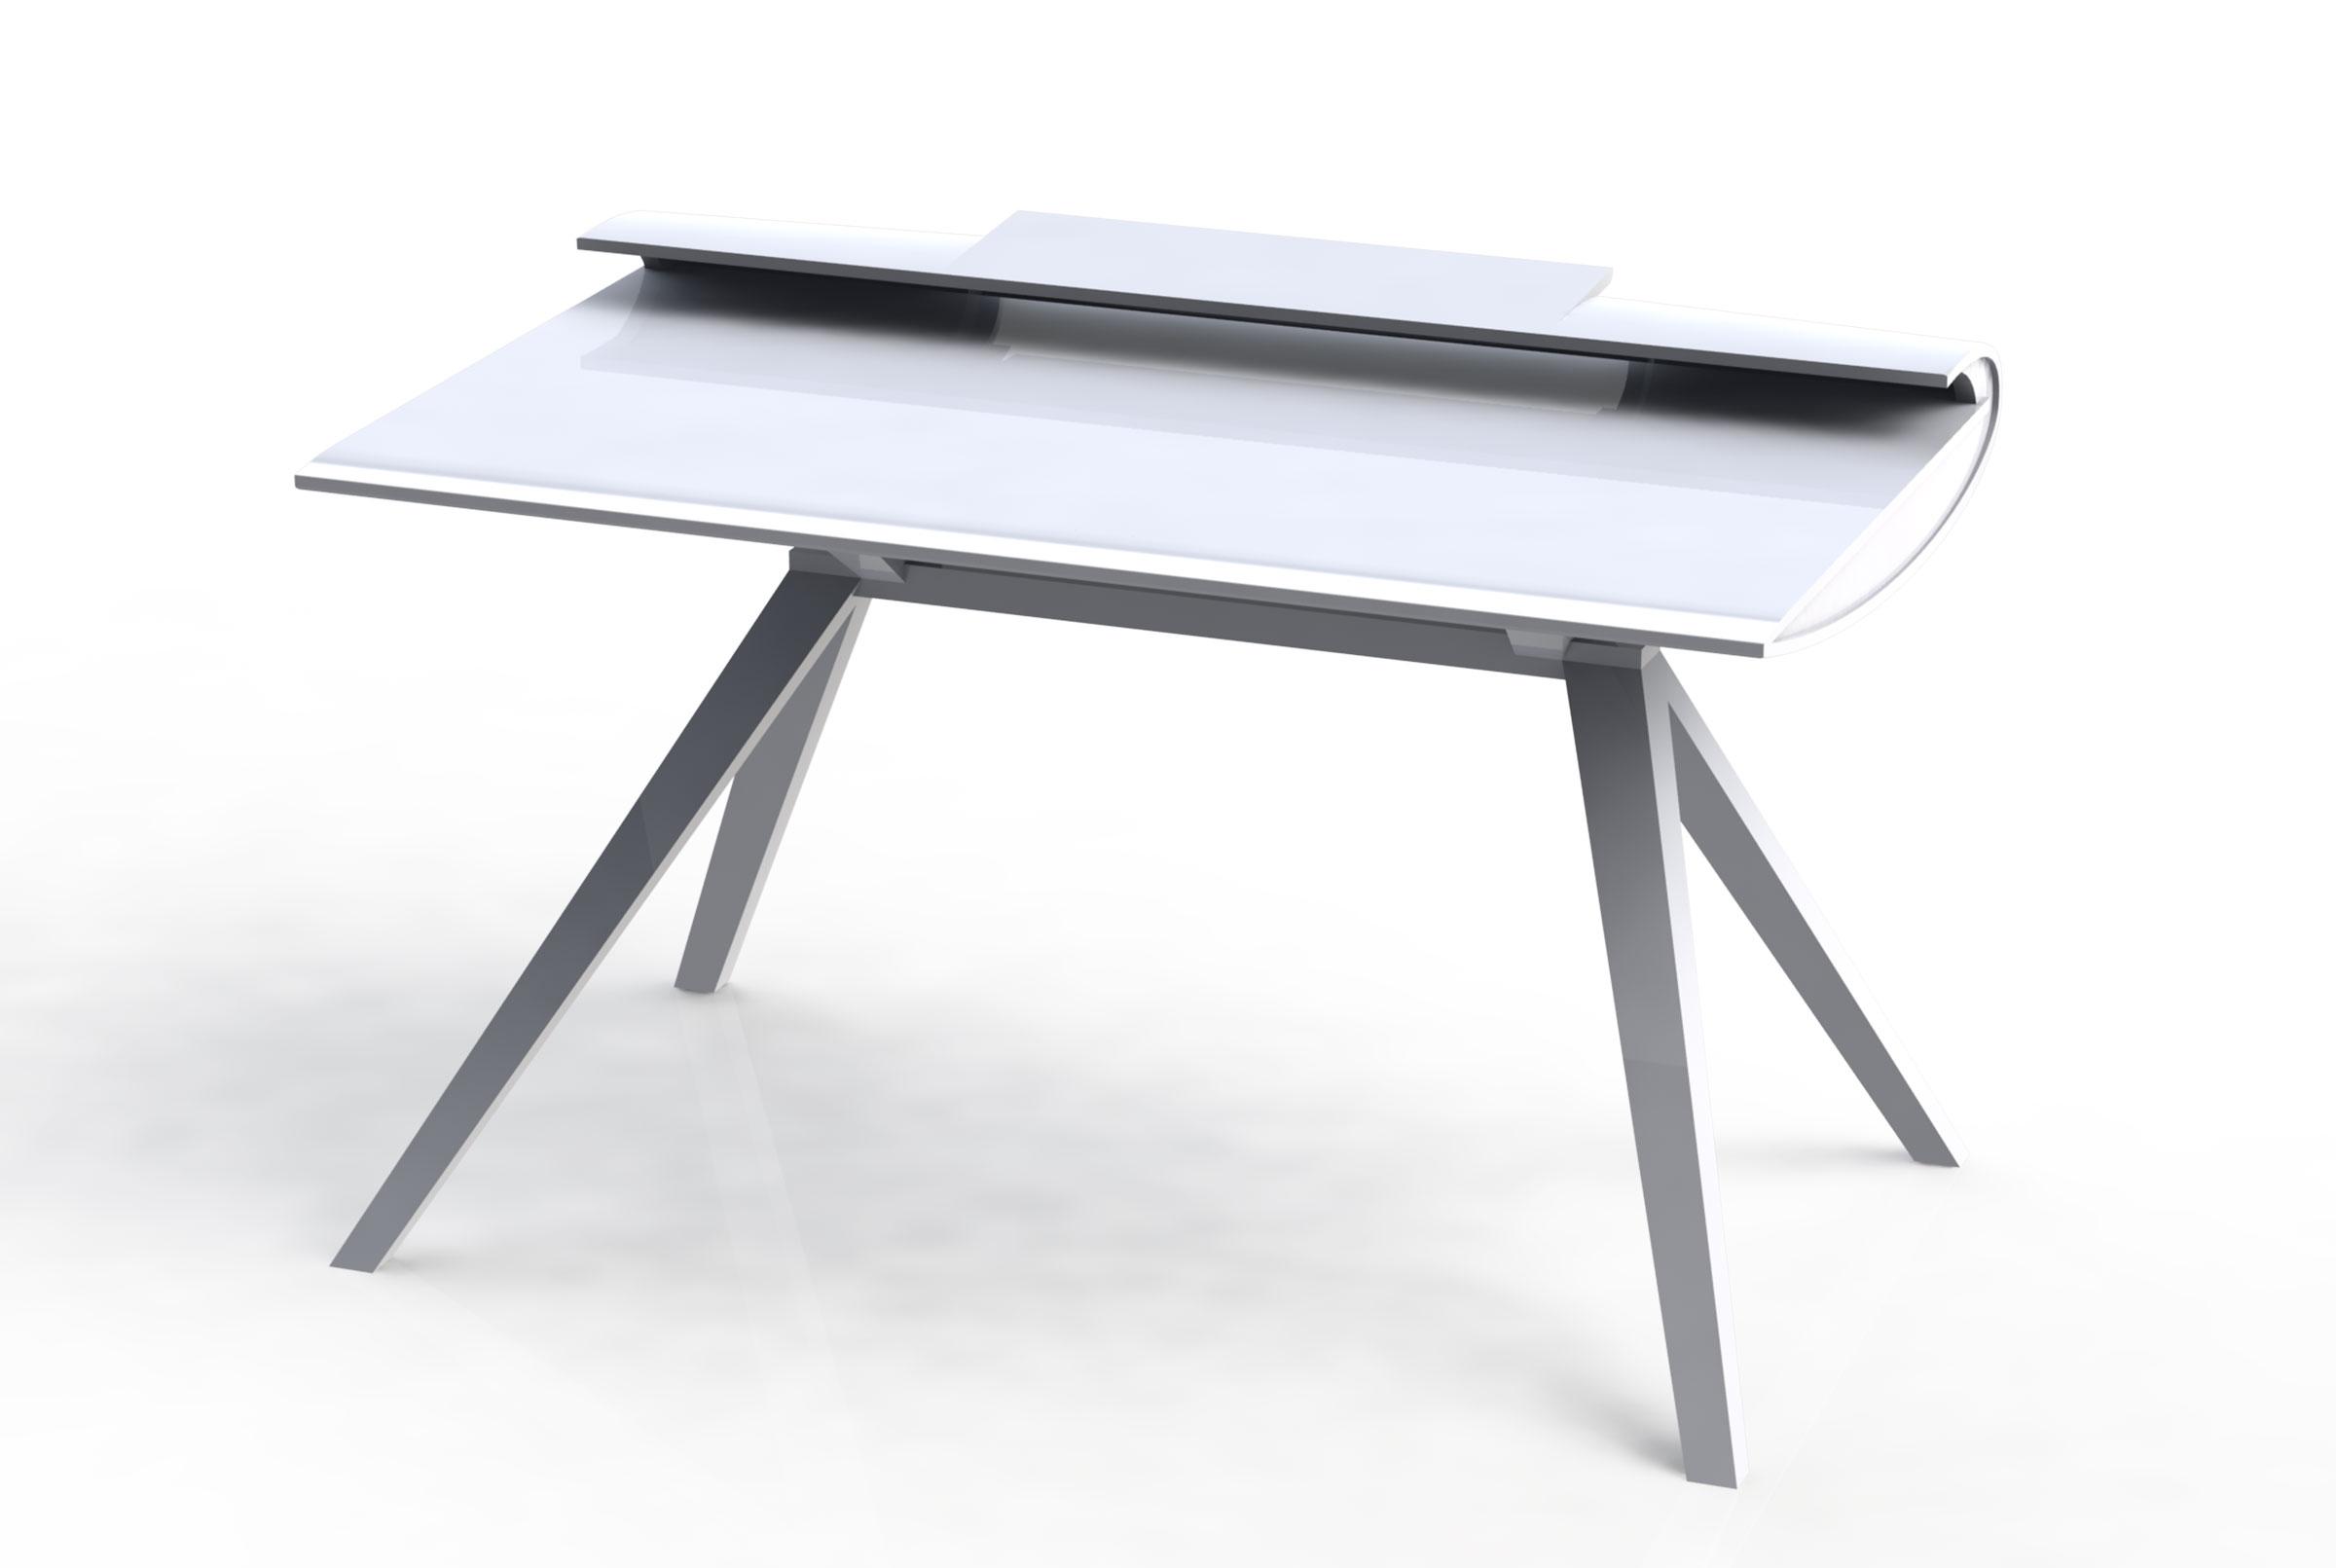 table5-3@2x.jpg